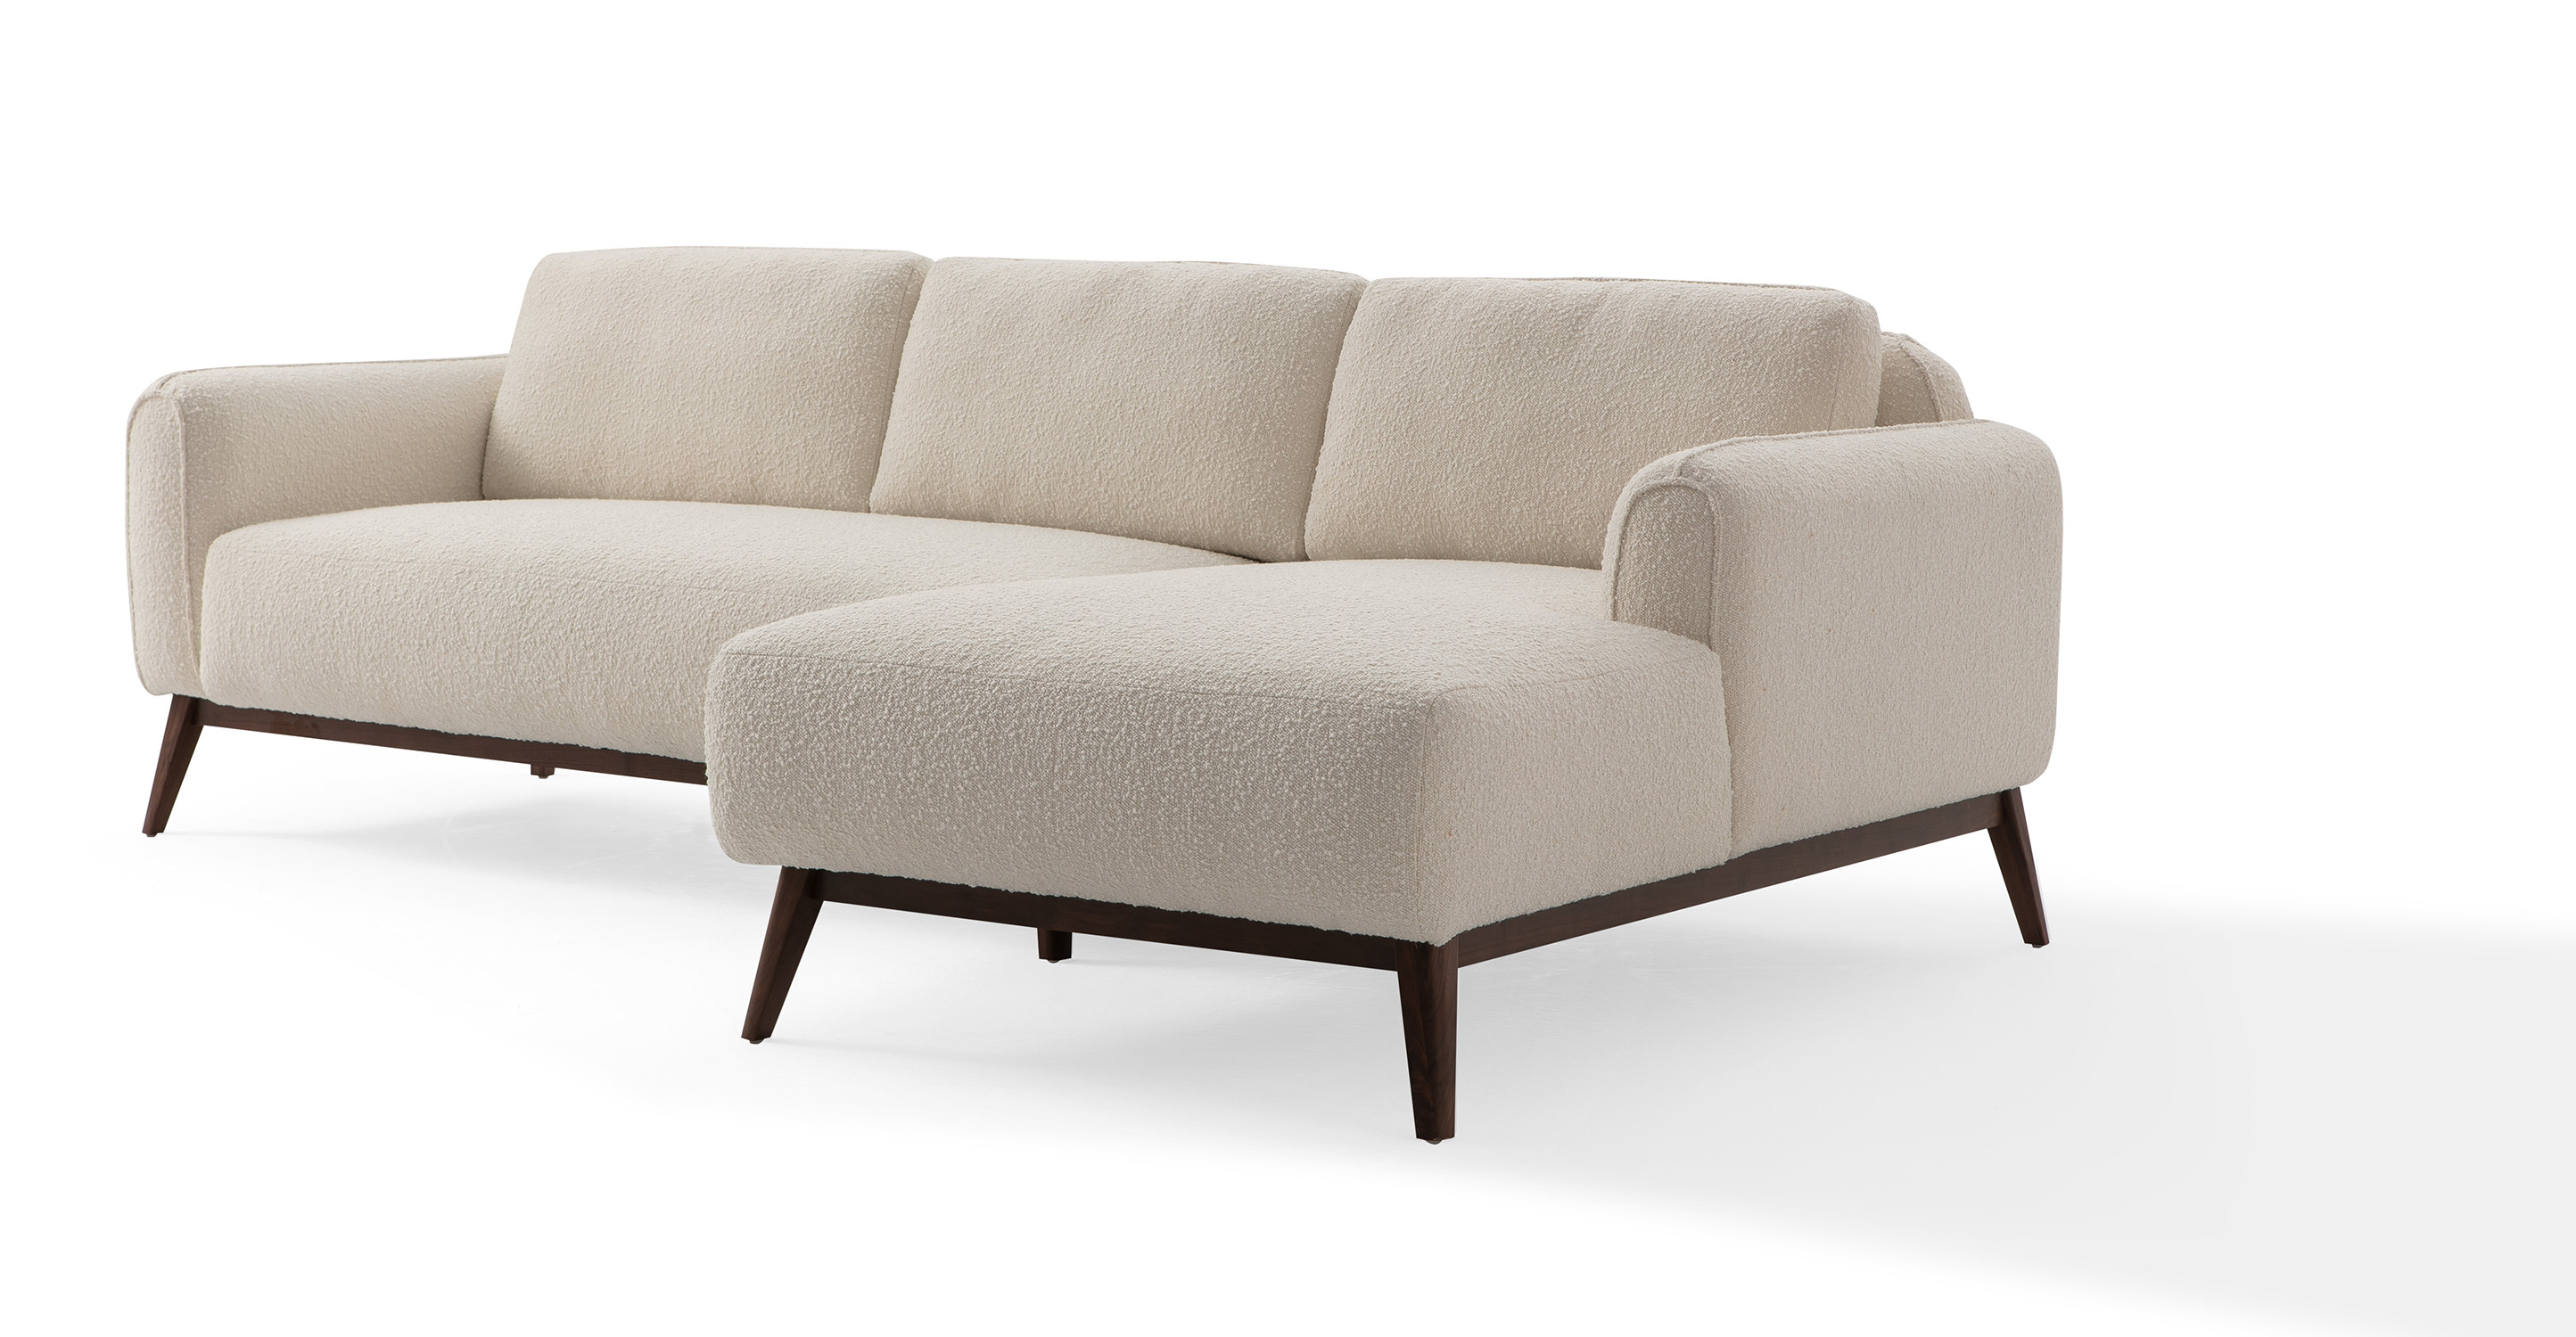 "Metro 100"" Fabric Sofa Sectional Right, Blanc Boucle"